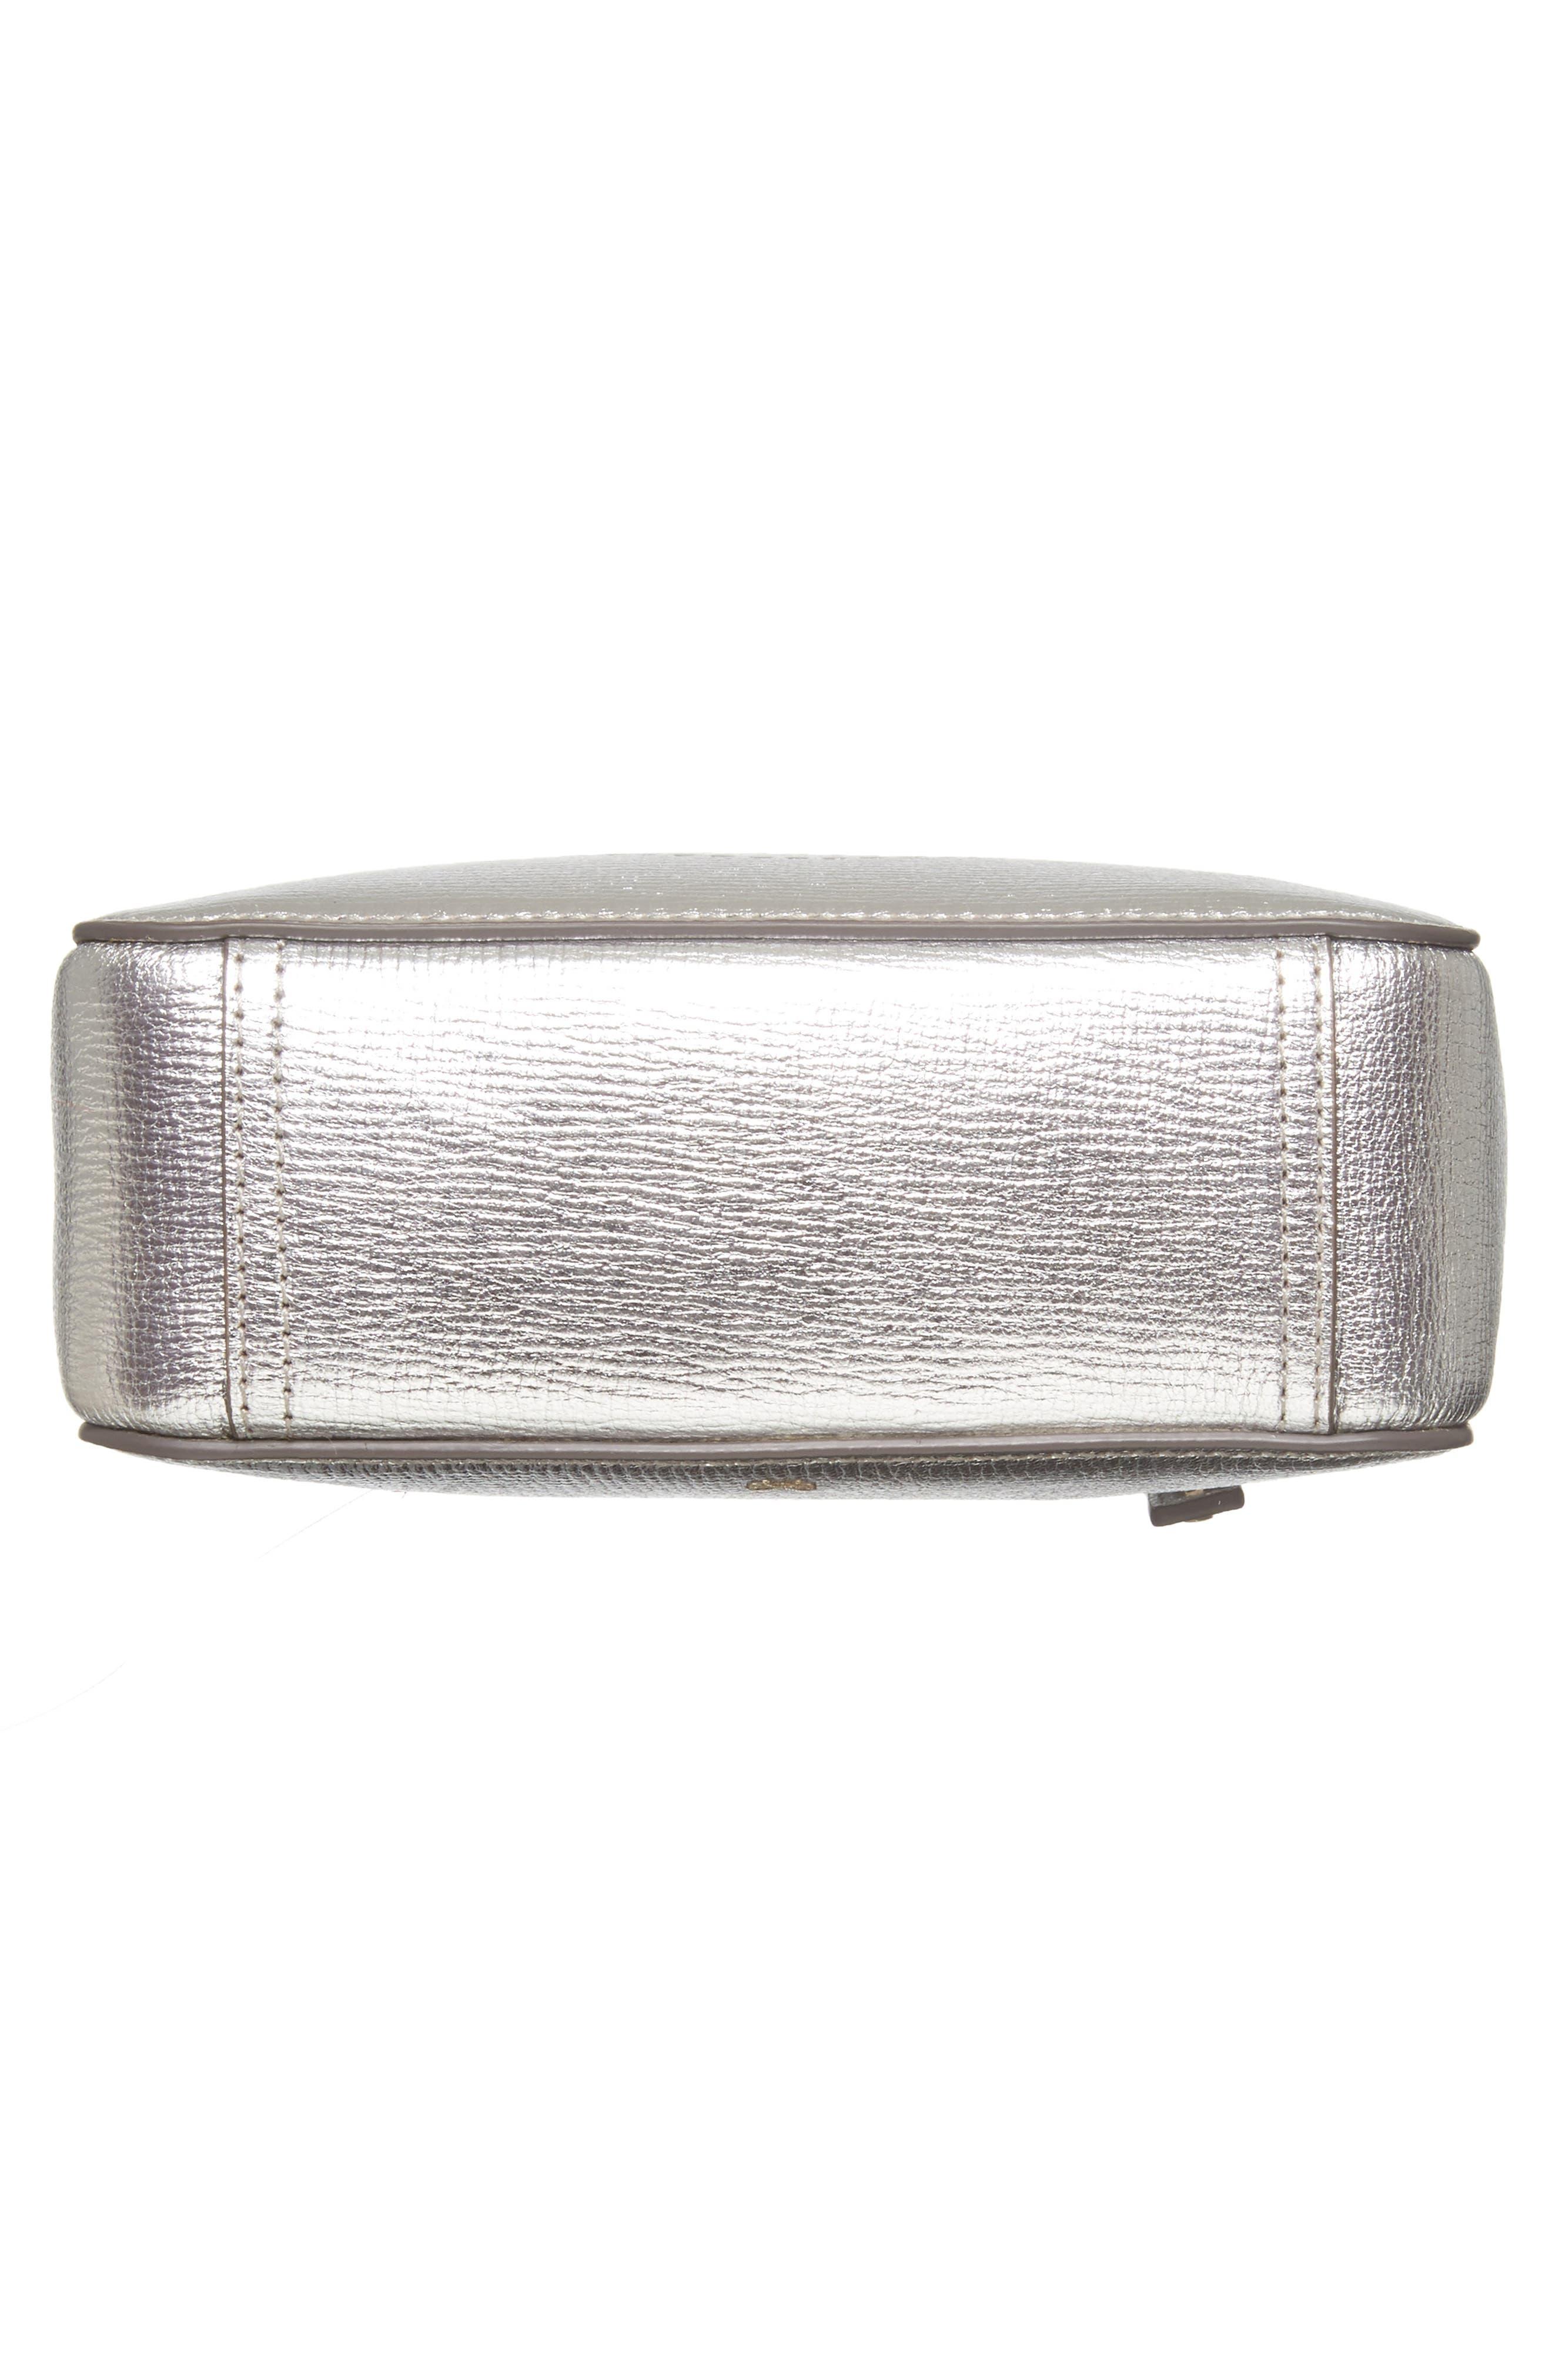 Smiley Metallic Leather Crossbody Bag,                             Alternate thumbnail 6, color,                             040